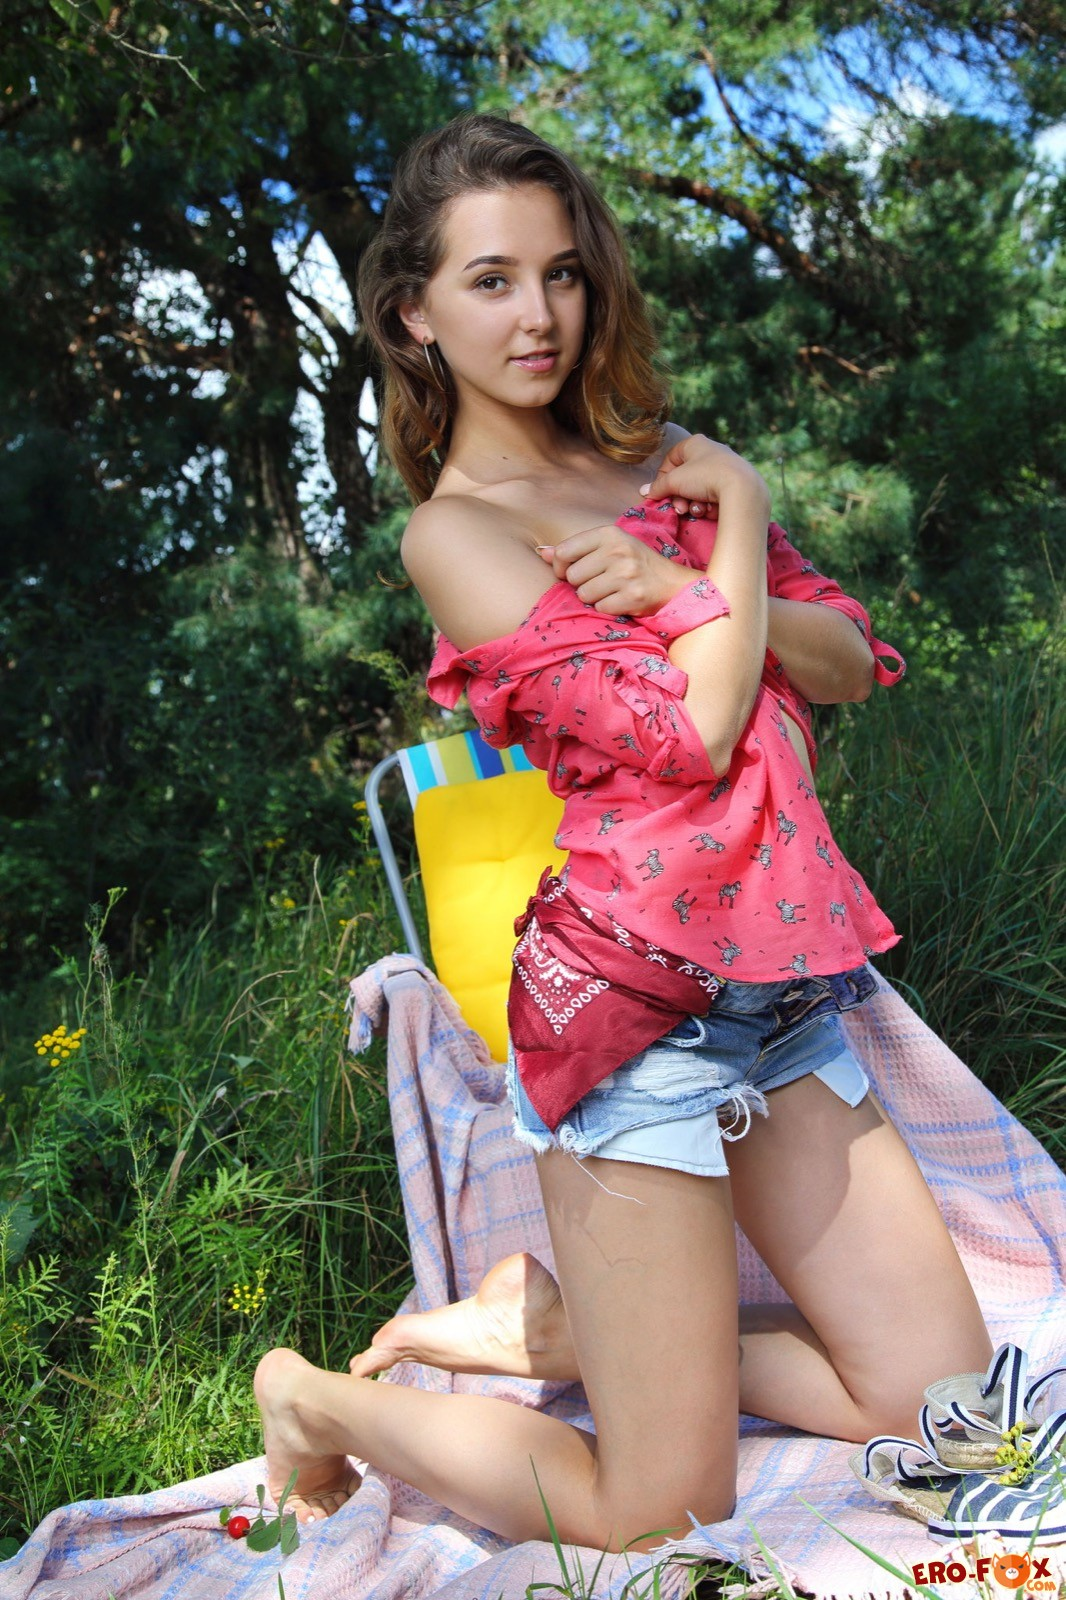 Молодая голая девка с плоским животом на природе - фото